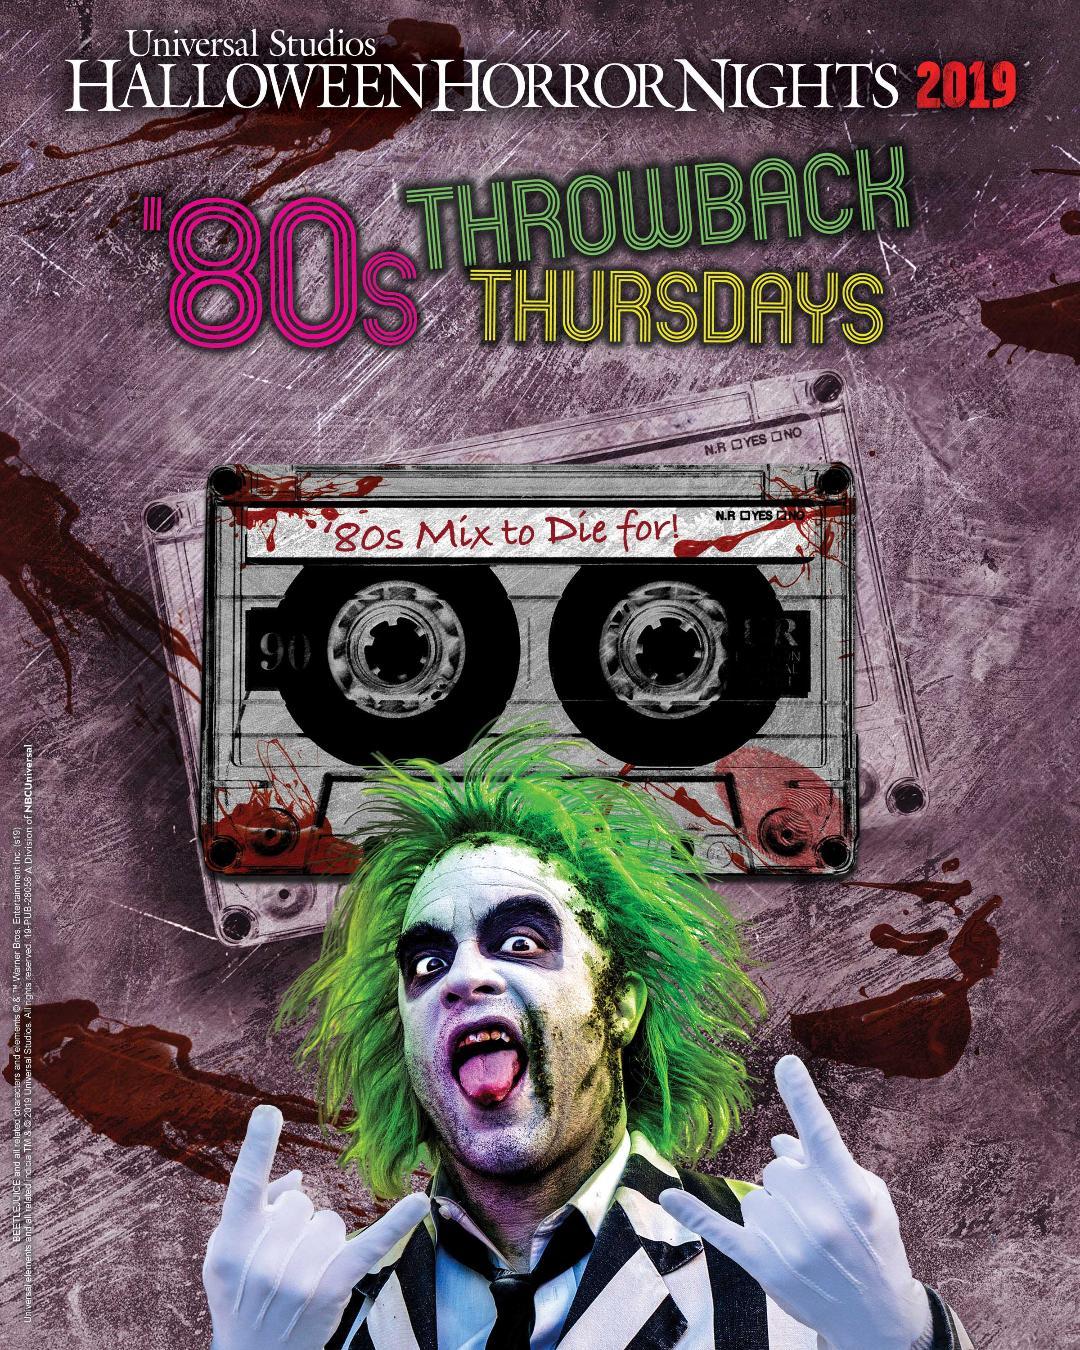 Halloween Horror Nights 2019 80s Throwback Thursdays Key Art